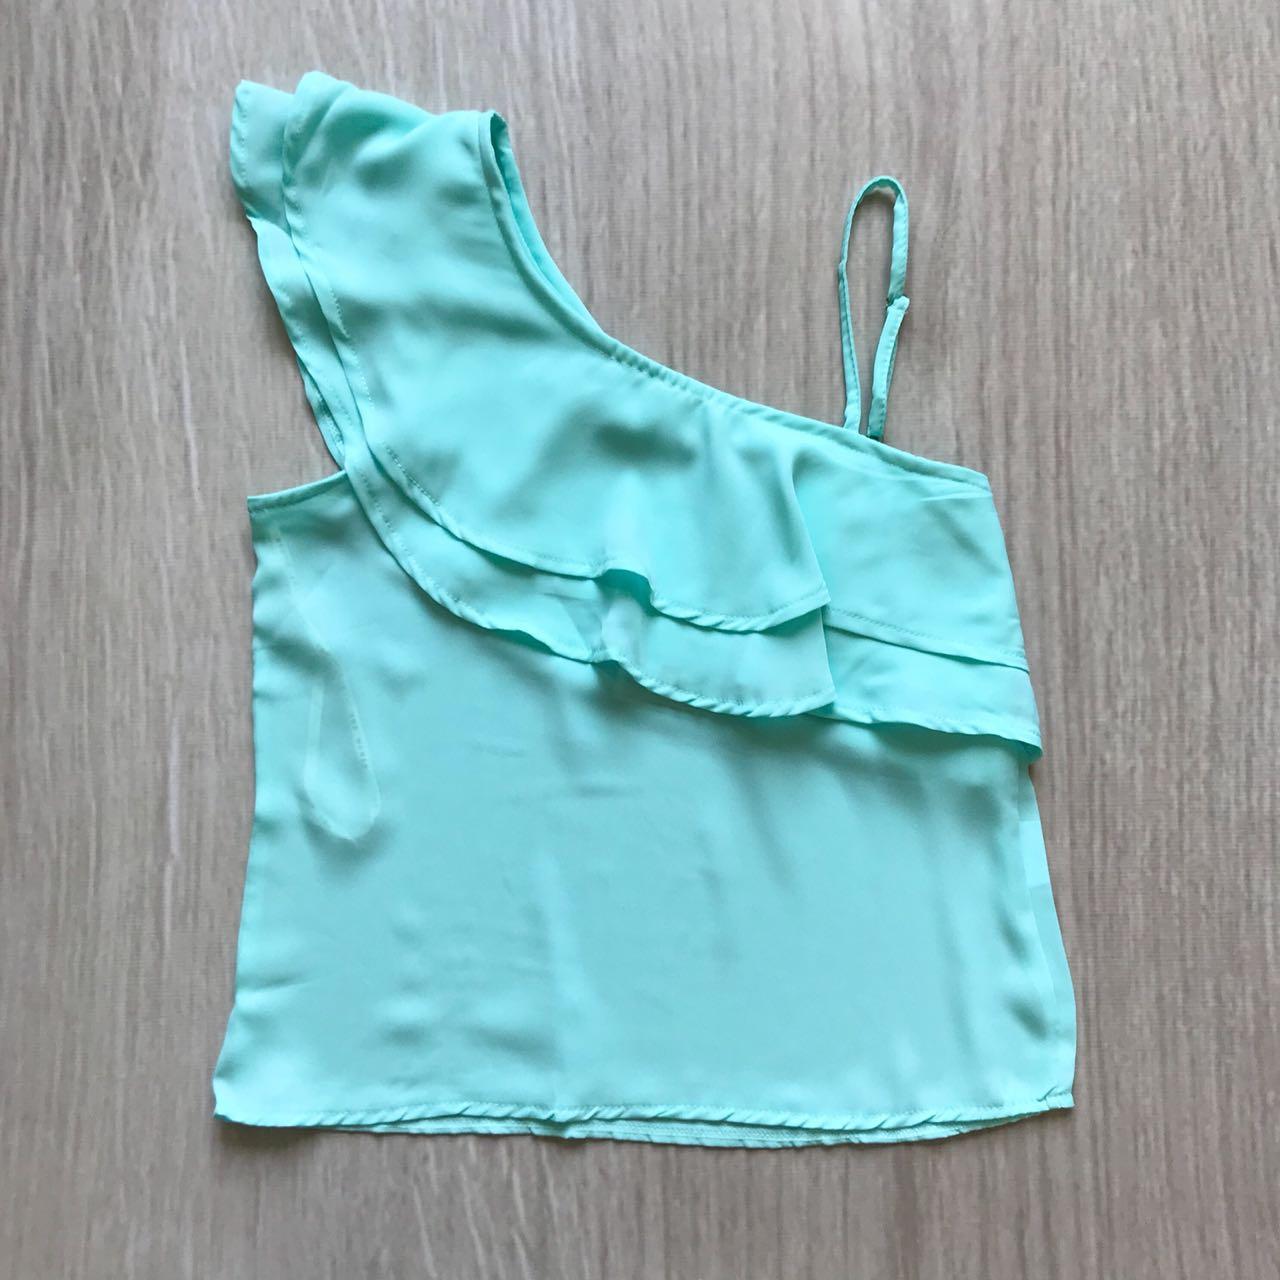 Blusa Assimétrica Turquesa